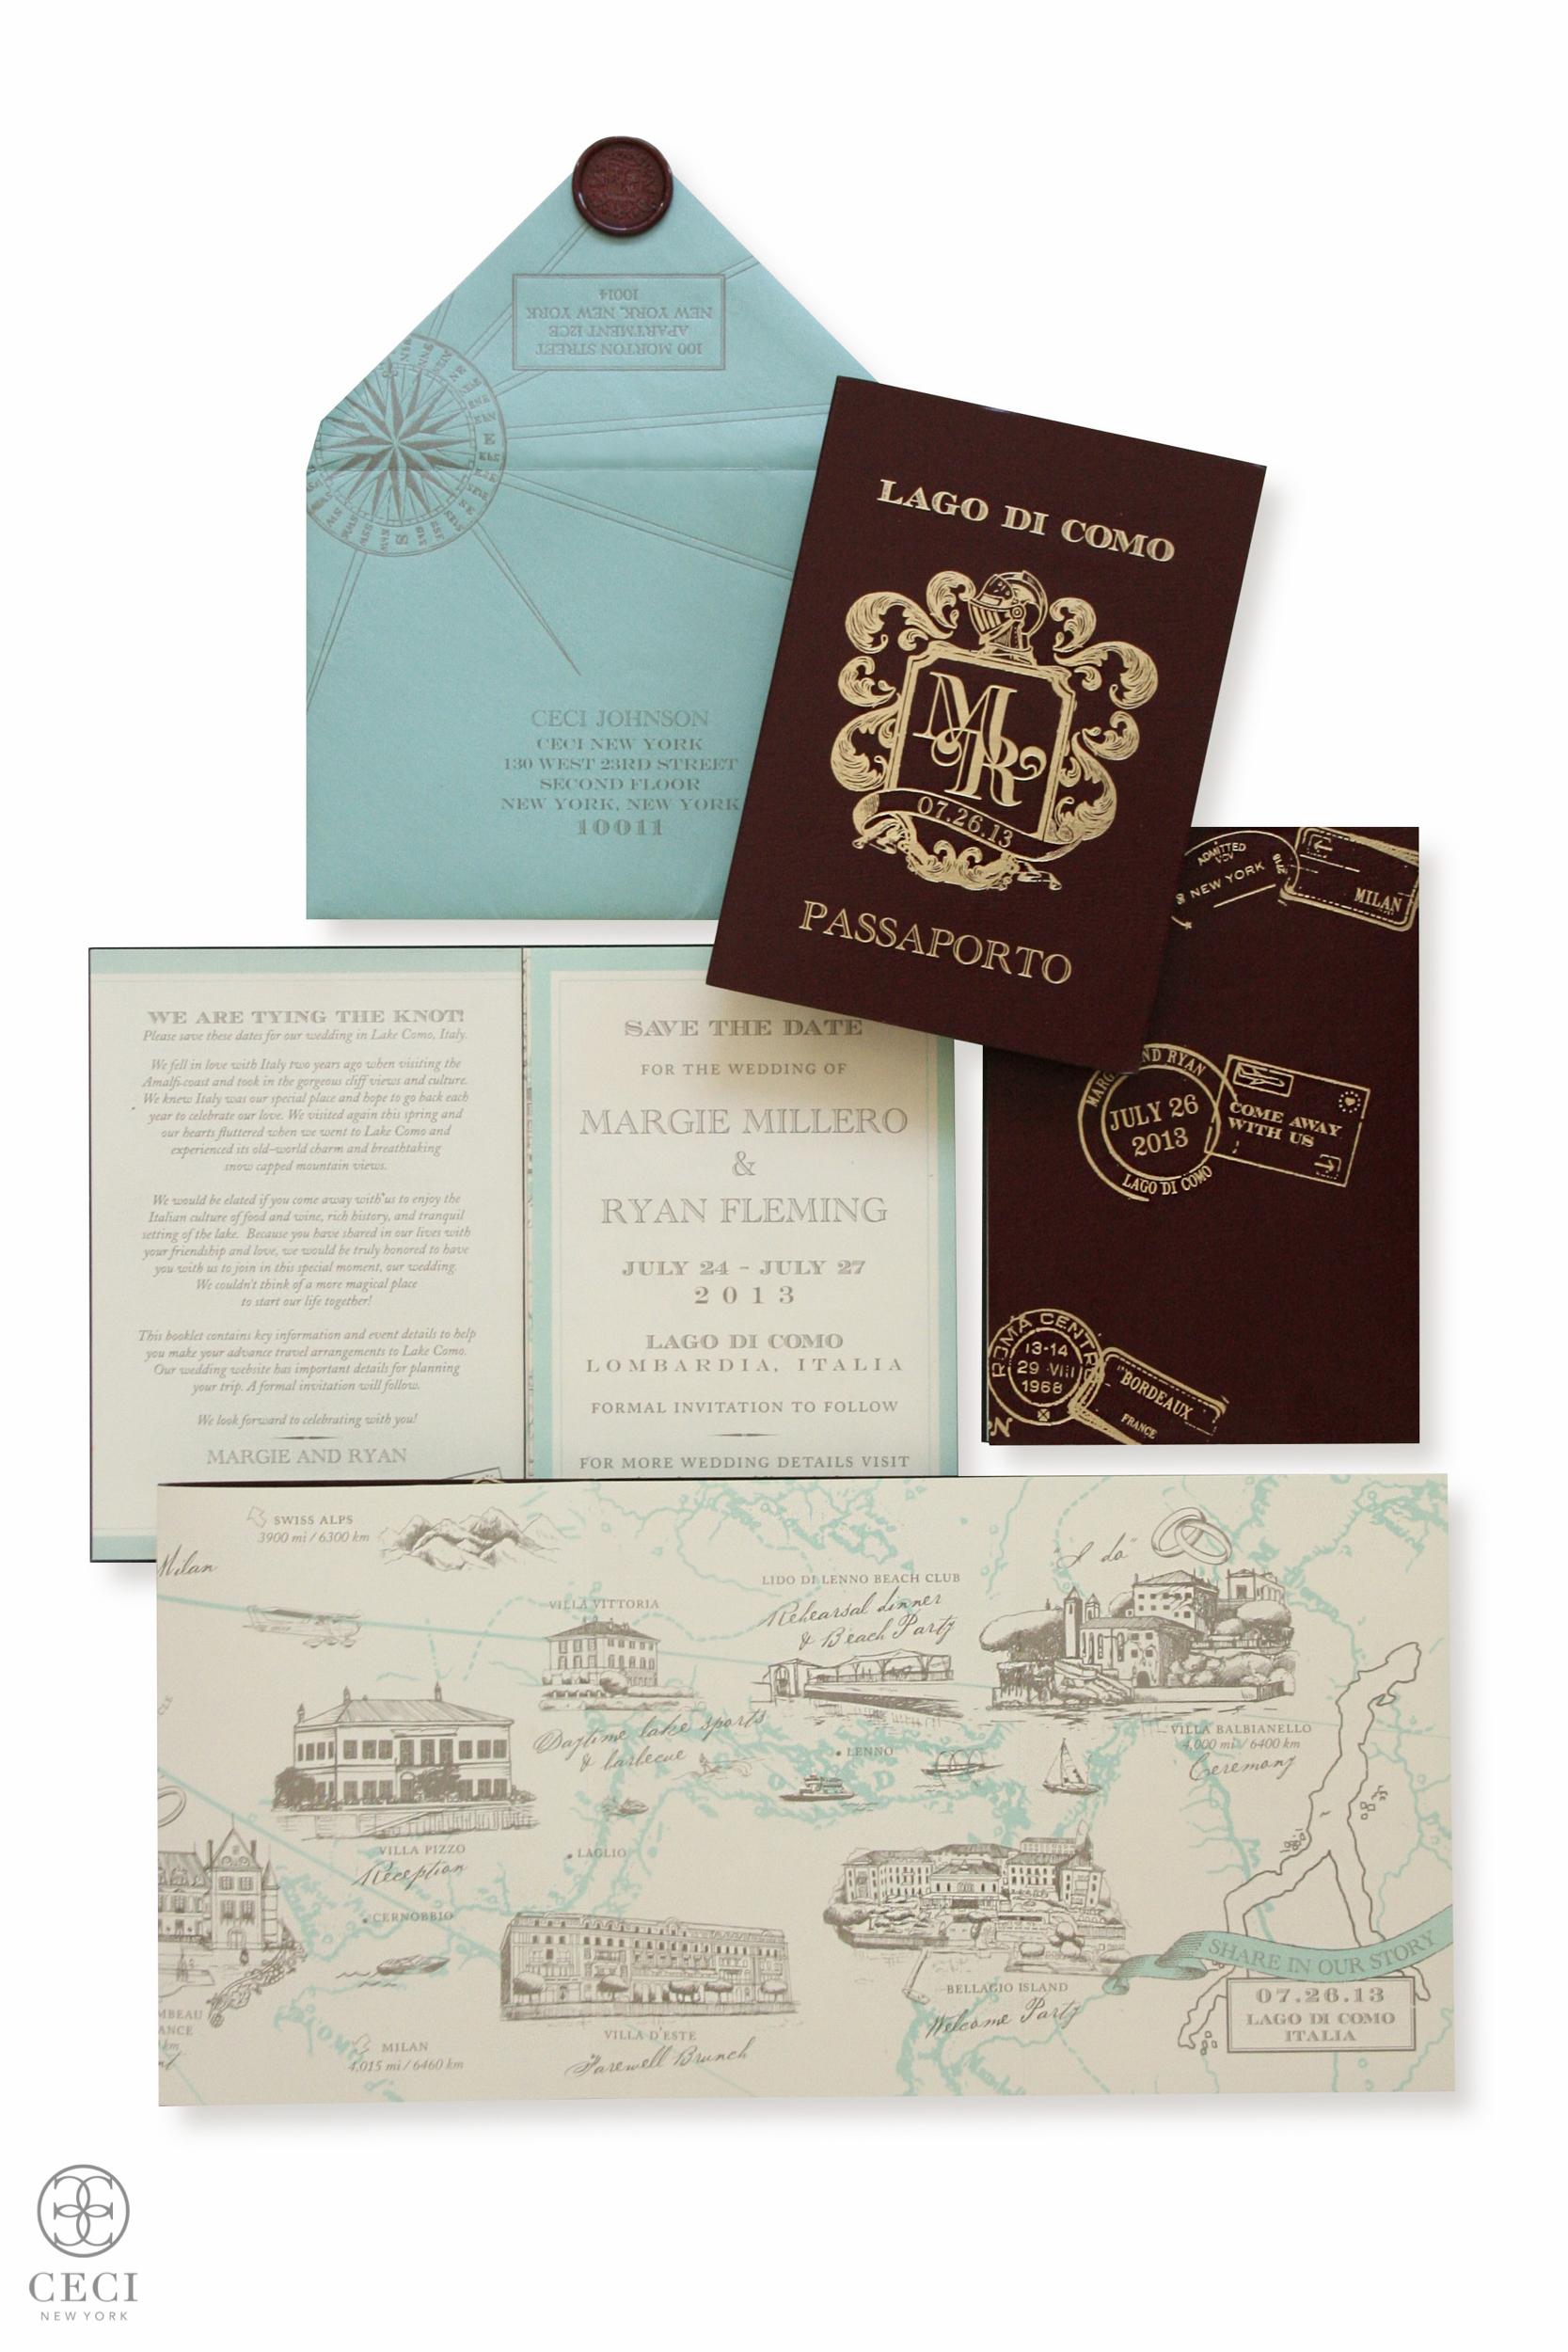 Ceci_New_York_Wedding_Lake_Como_Italy_Luxury_Style_Custom_Invitation-2.jpg